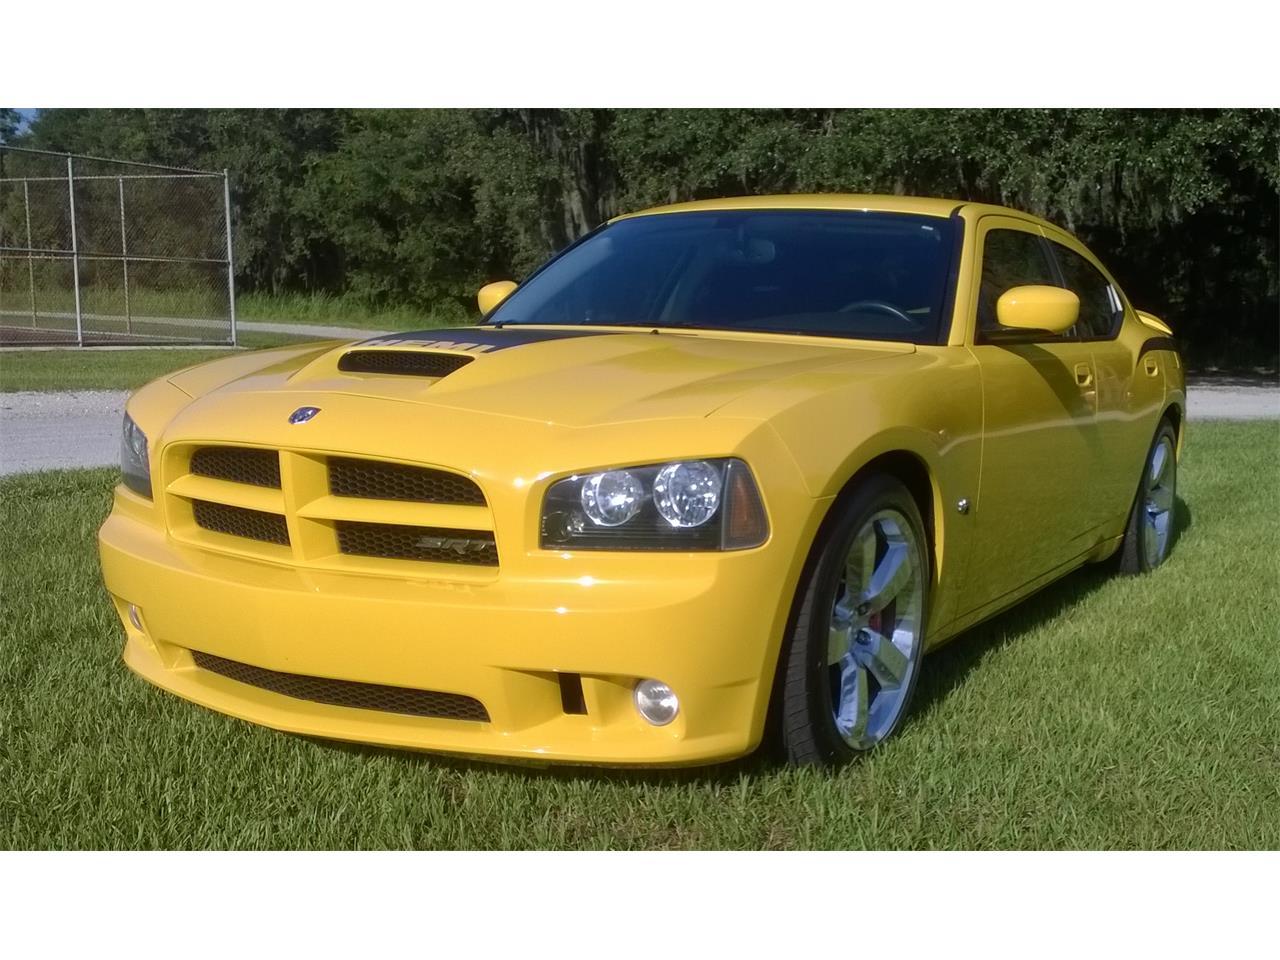 2007 Dodge Charger For Sale >> For Sale 2007 Dodge Charger In Riverview Florida